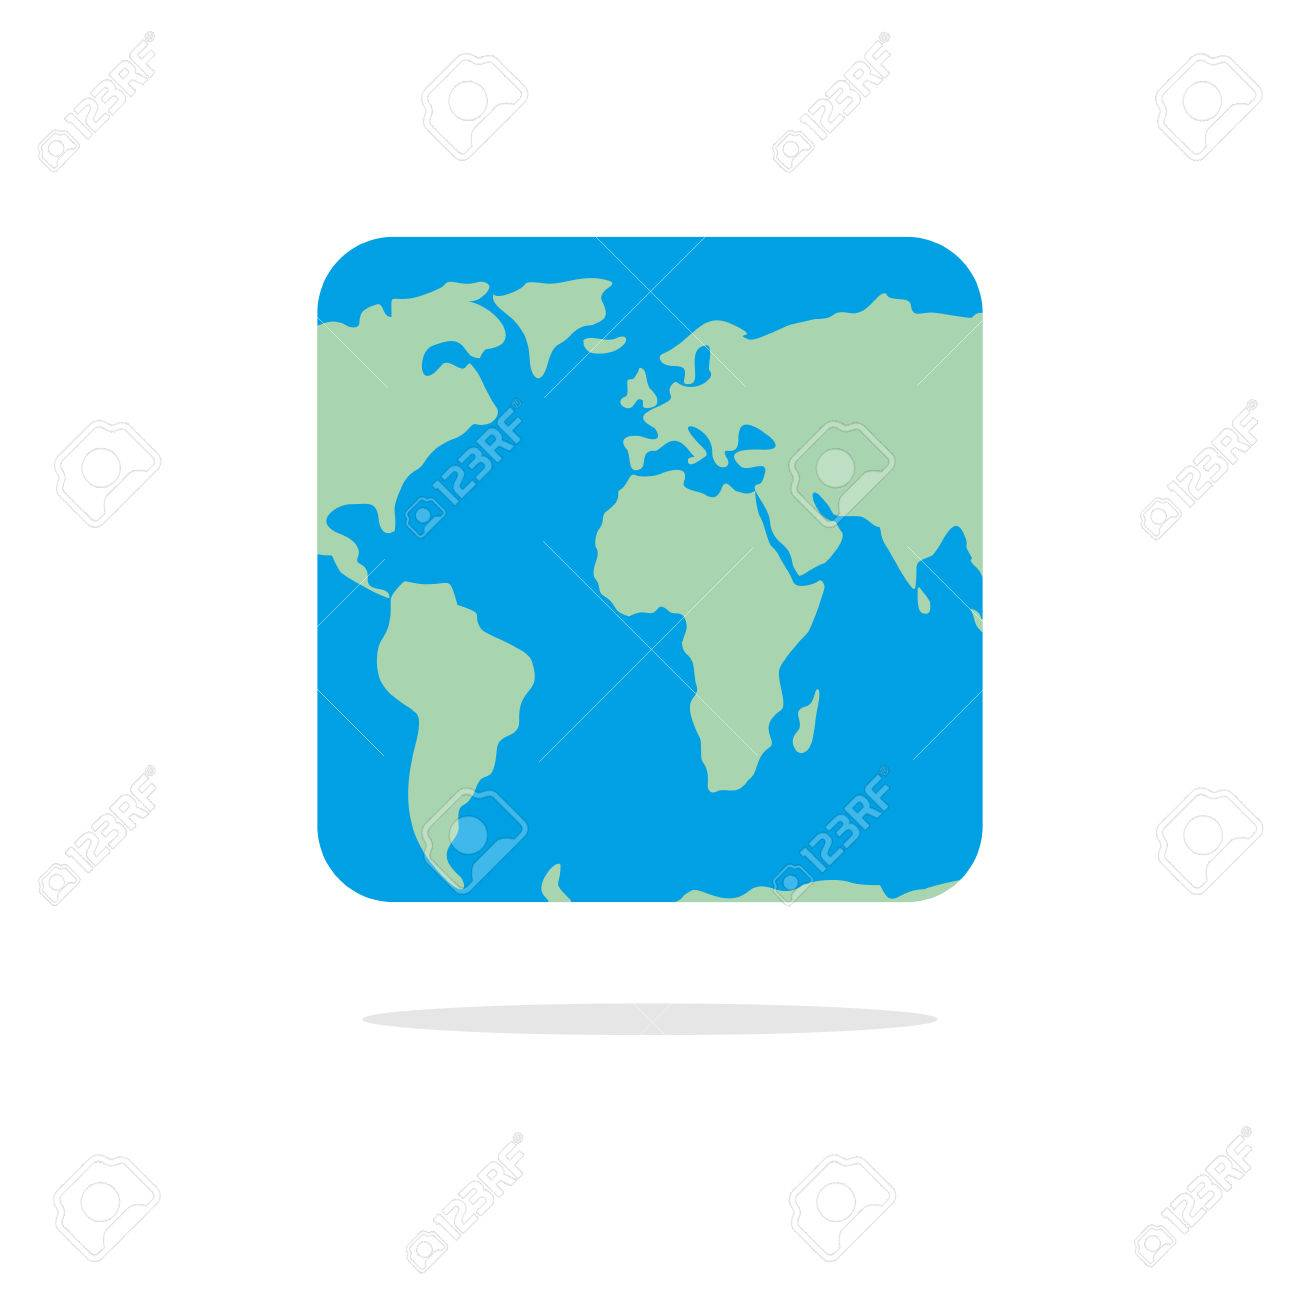 Square Earth Map.Square World Map Atlas Of Unusual Shape Square Earth Earth